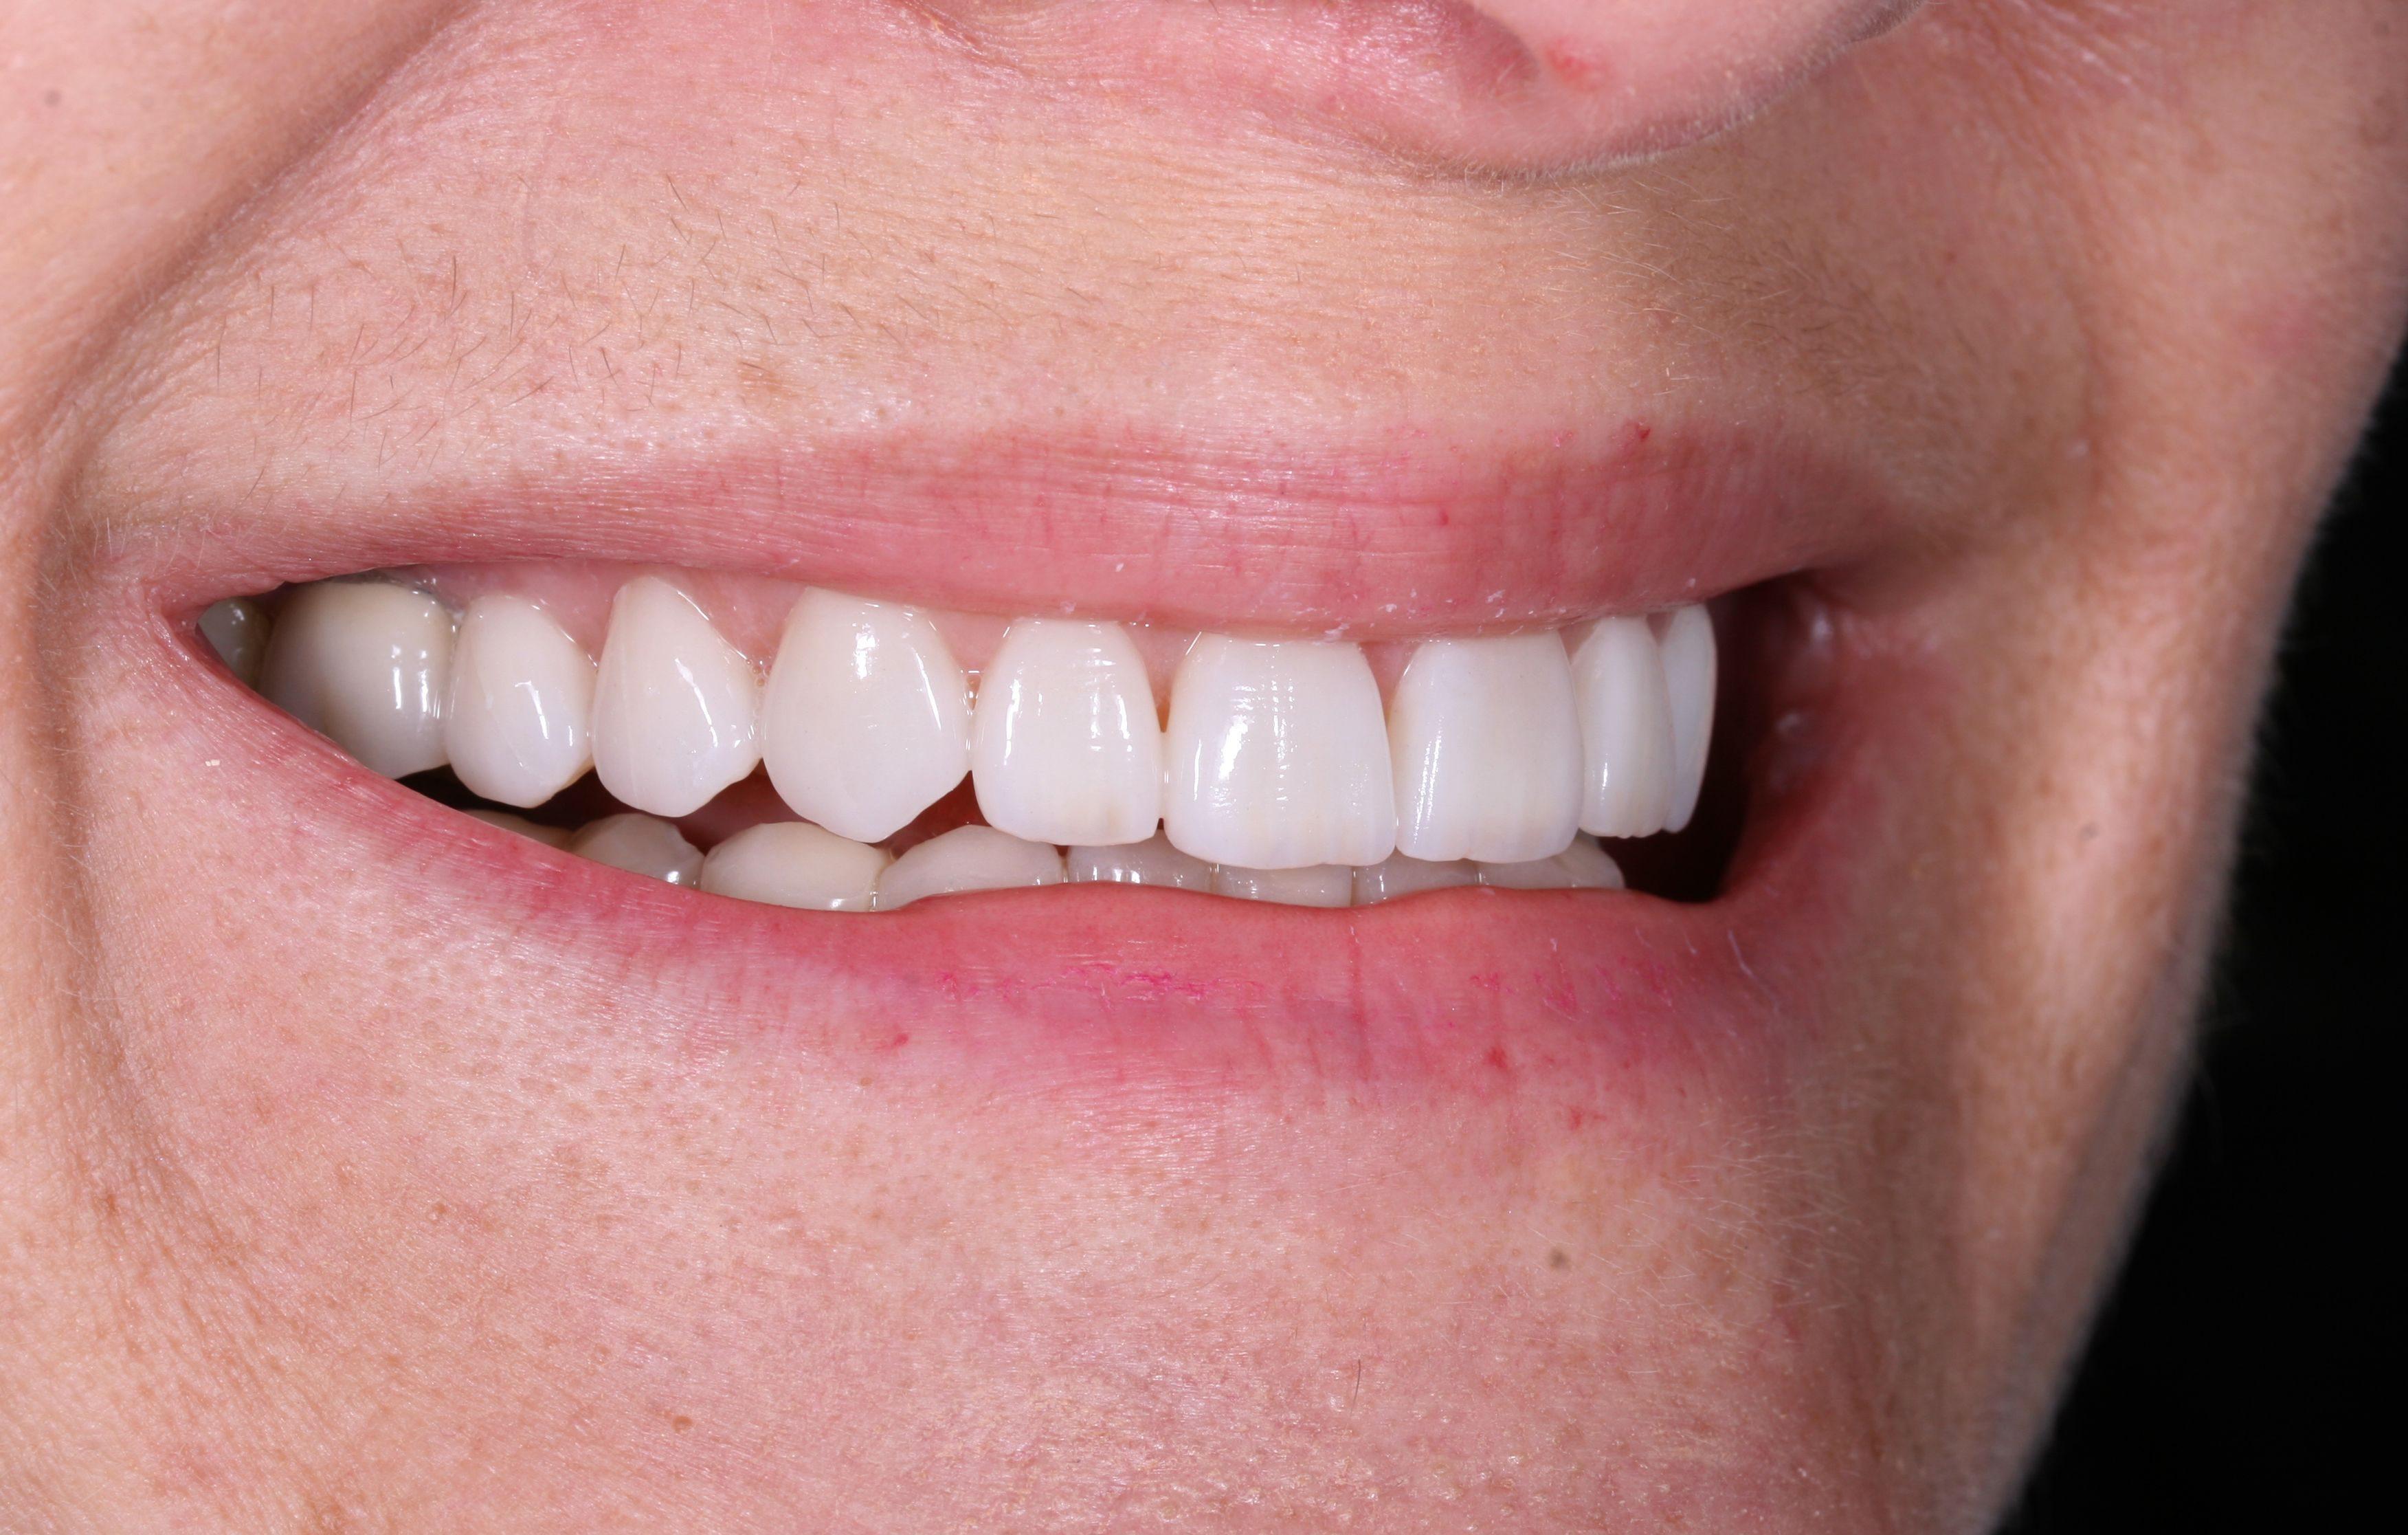 Final result after treatment of porcelain veneers